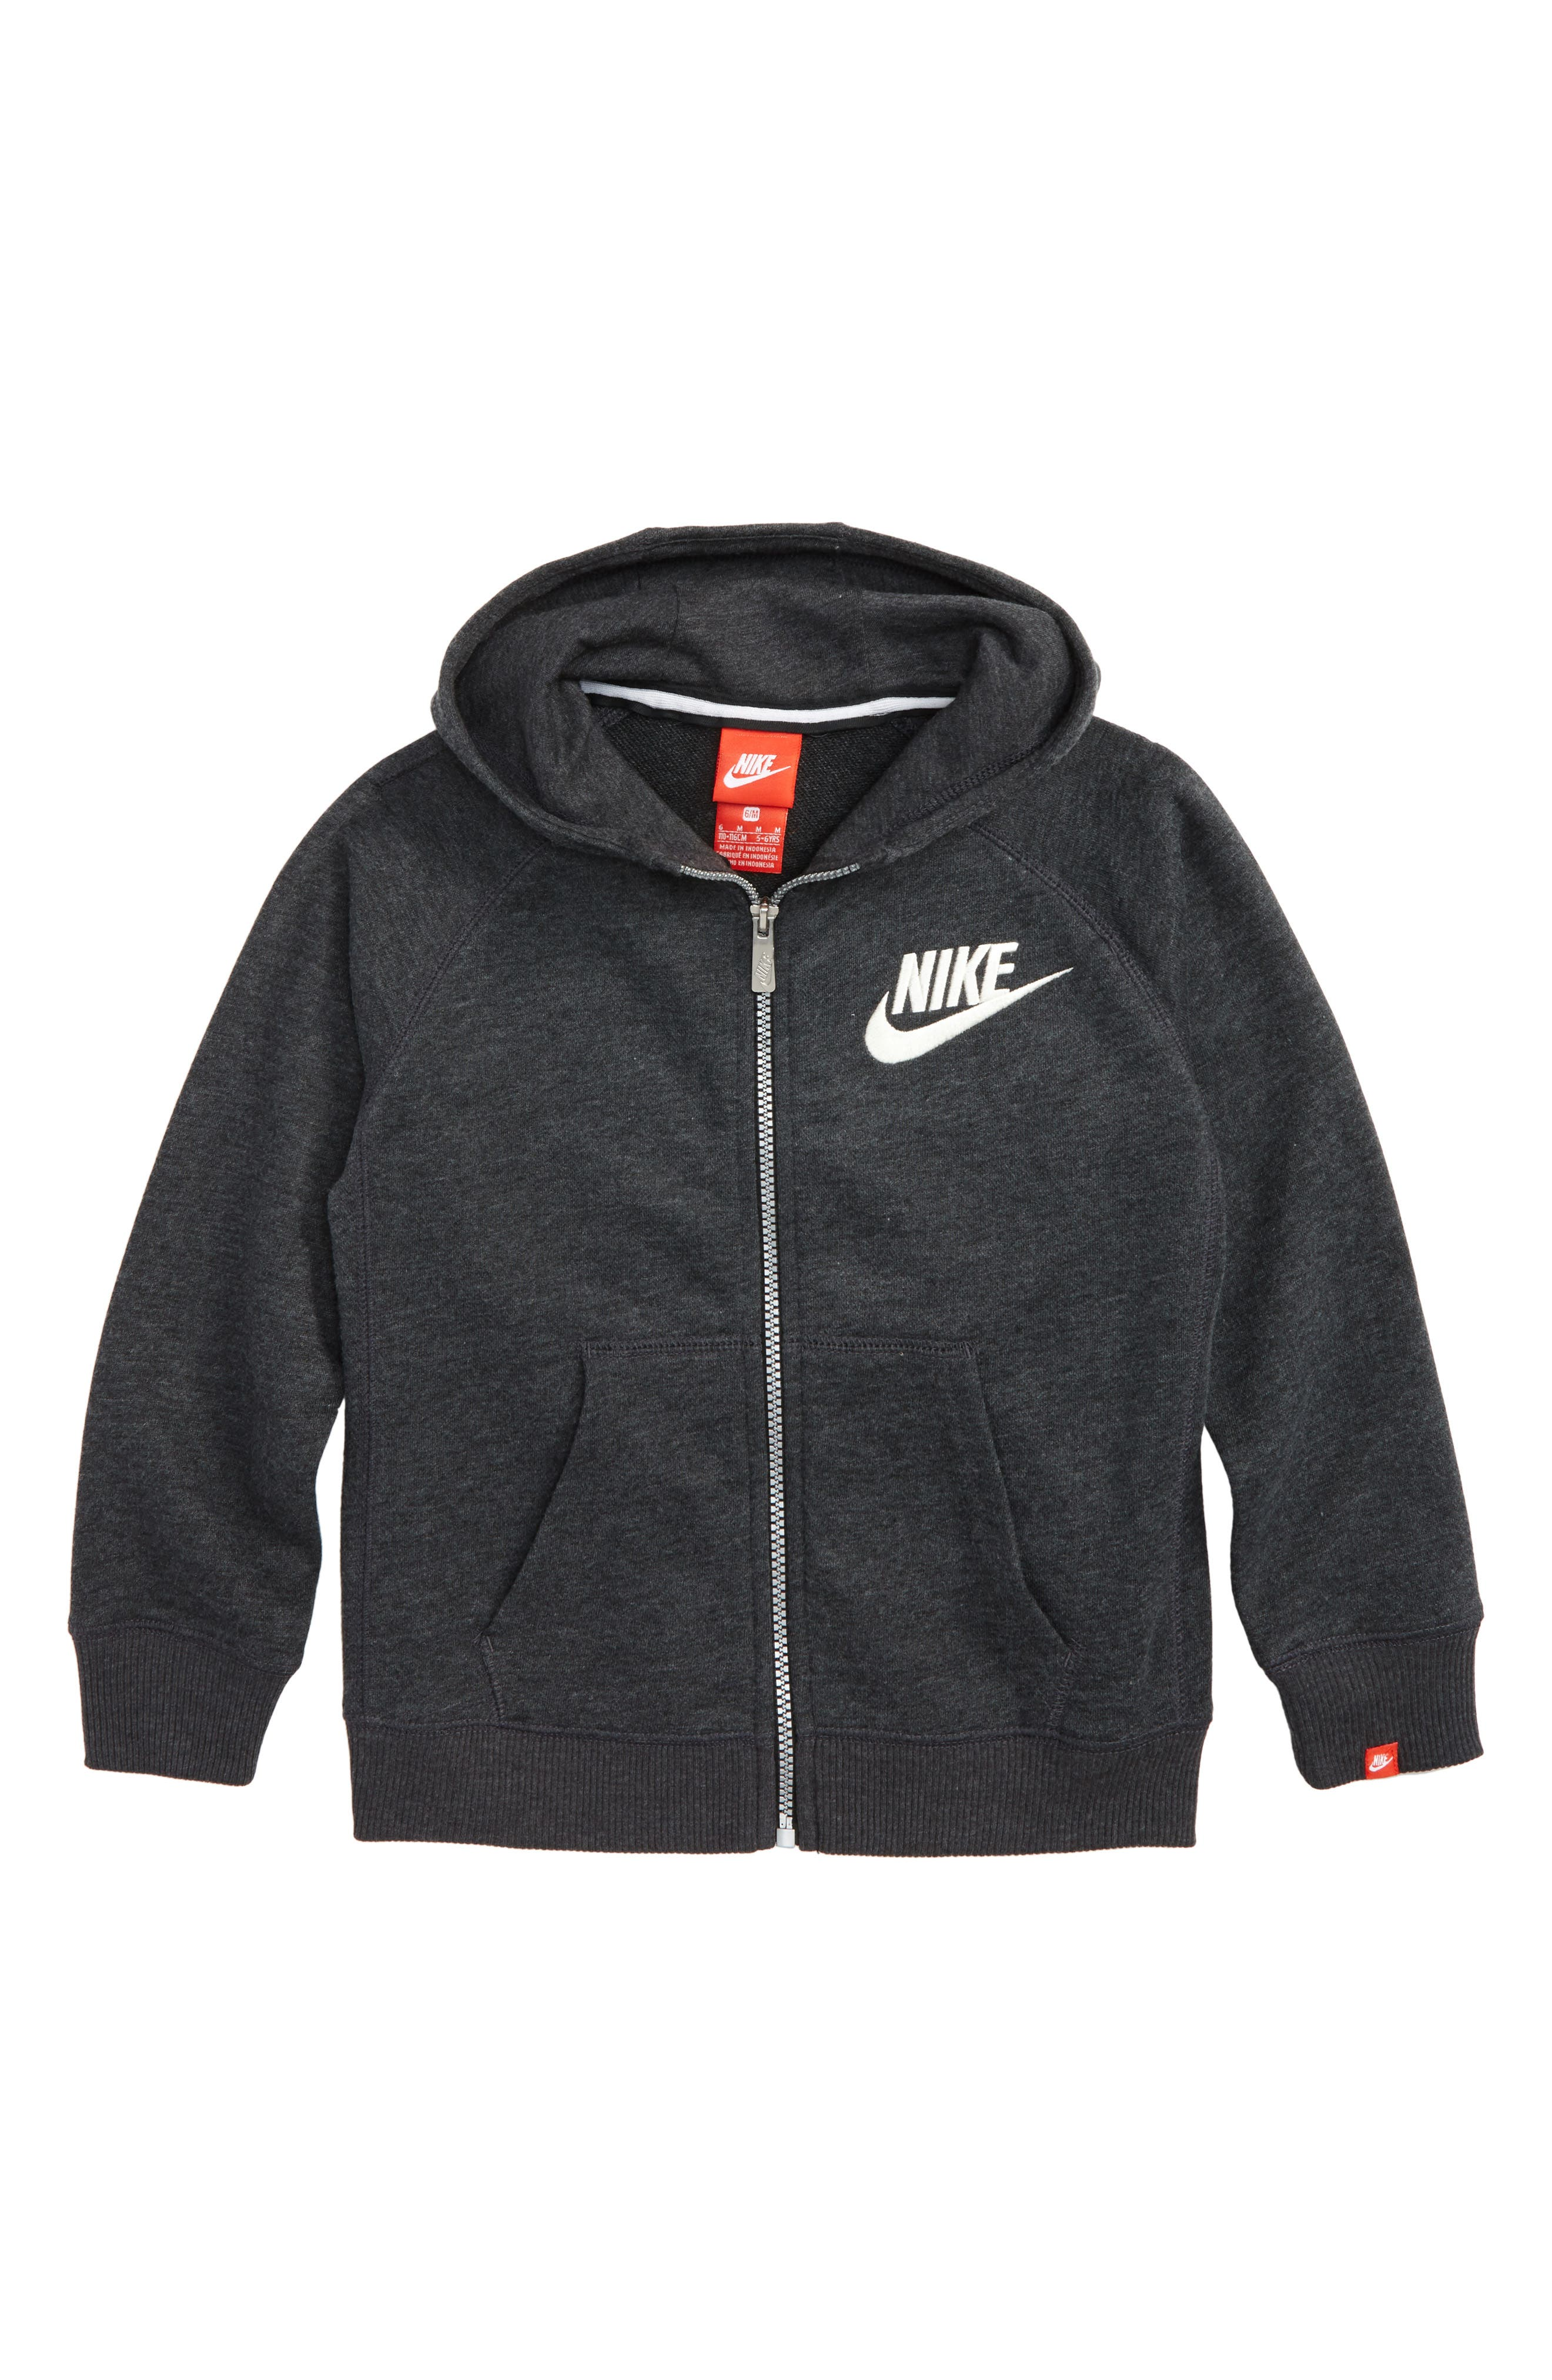 Main Image - Nike Legacy Full Zip Hoodie (Toddler Boys & Little Boys)